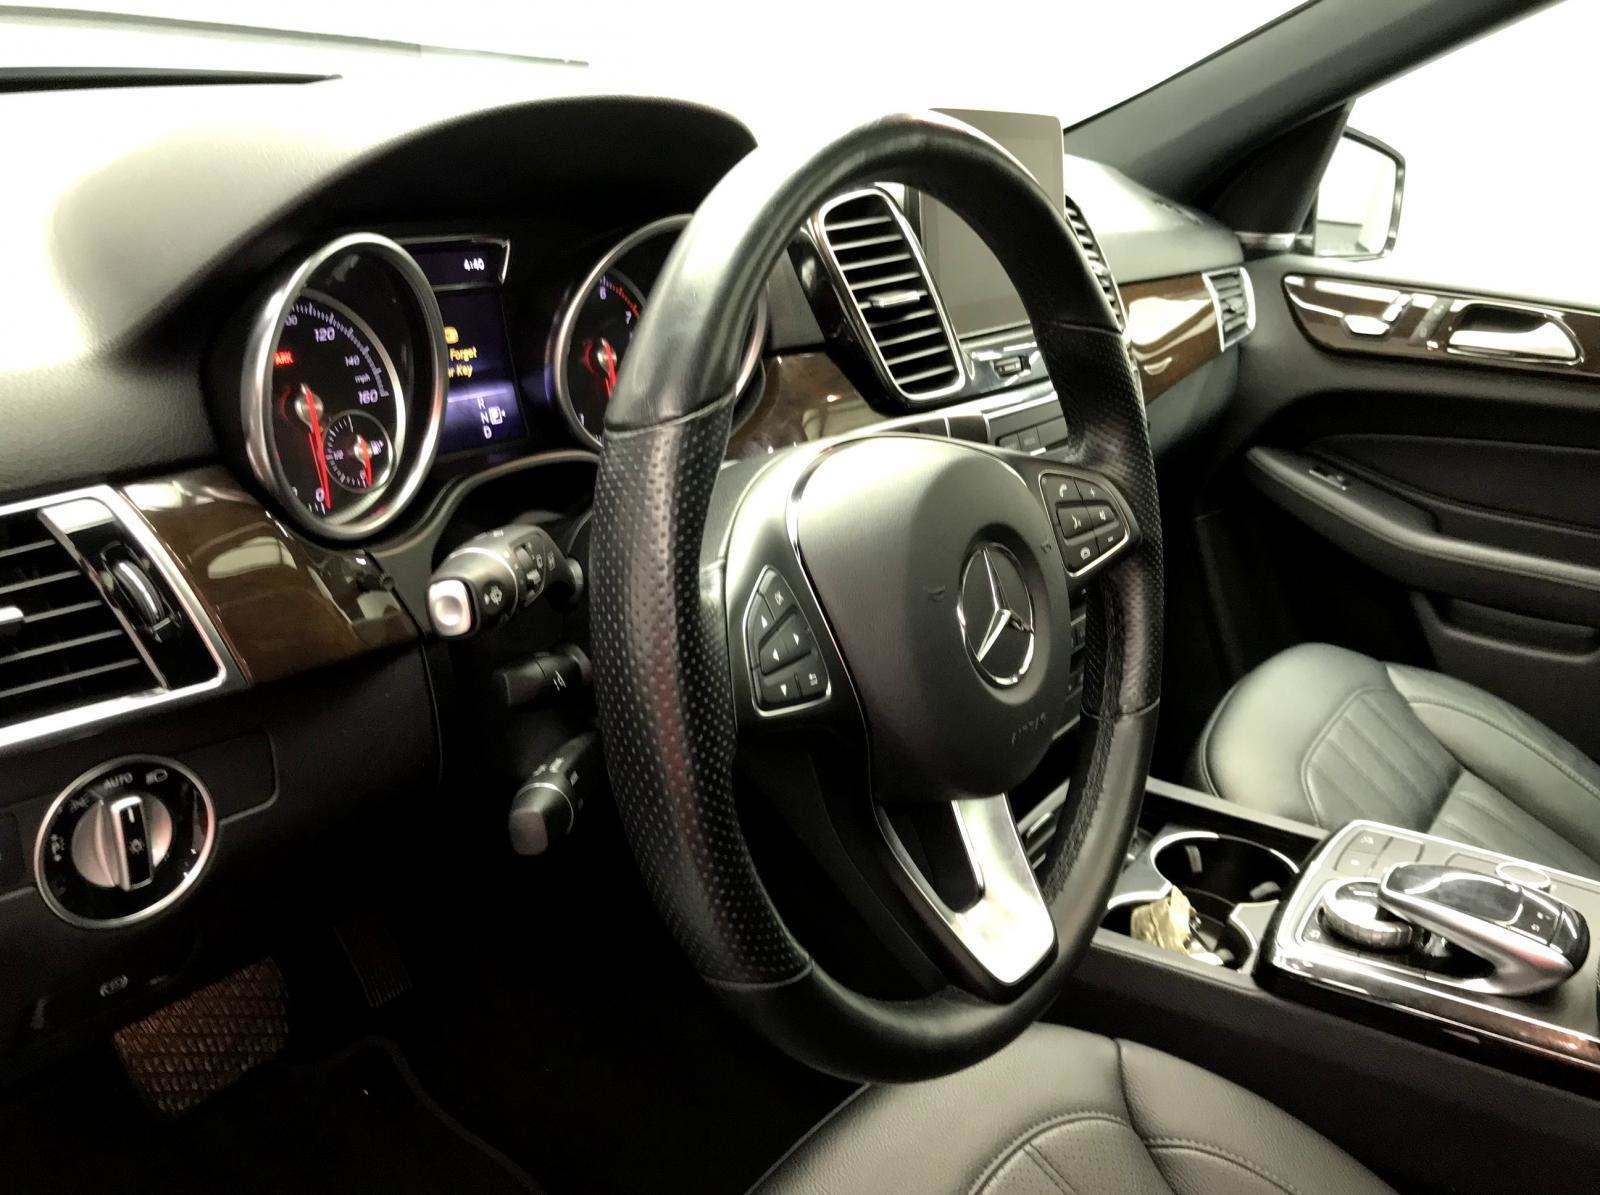 used Mercedes-Benz GLE-Class 2018 vin: 4JGDA5HB9JB131429